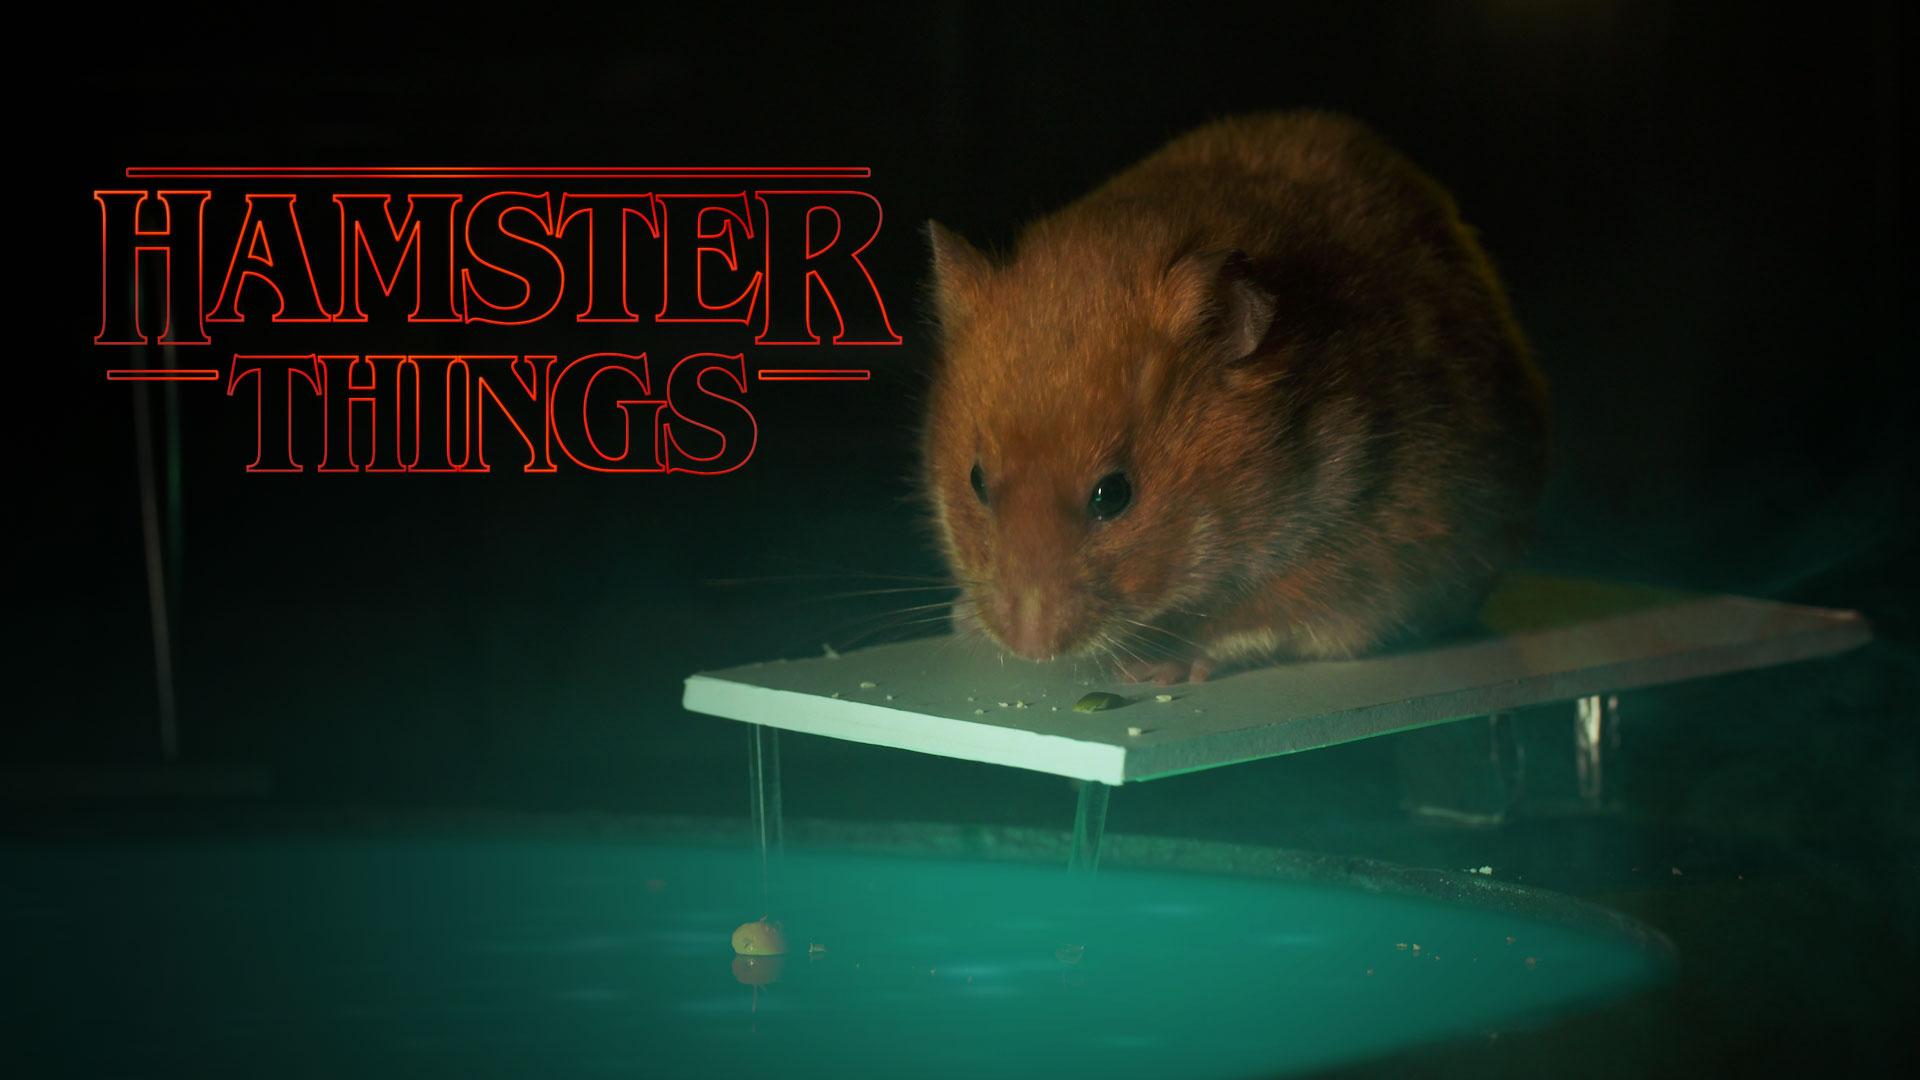 introducing hamster things